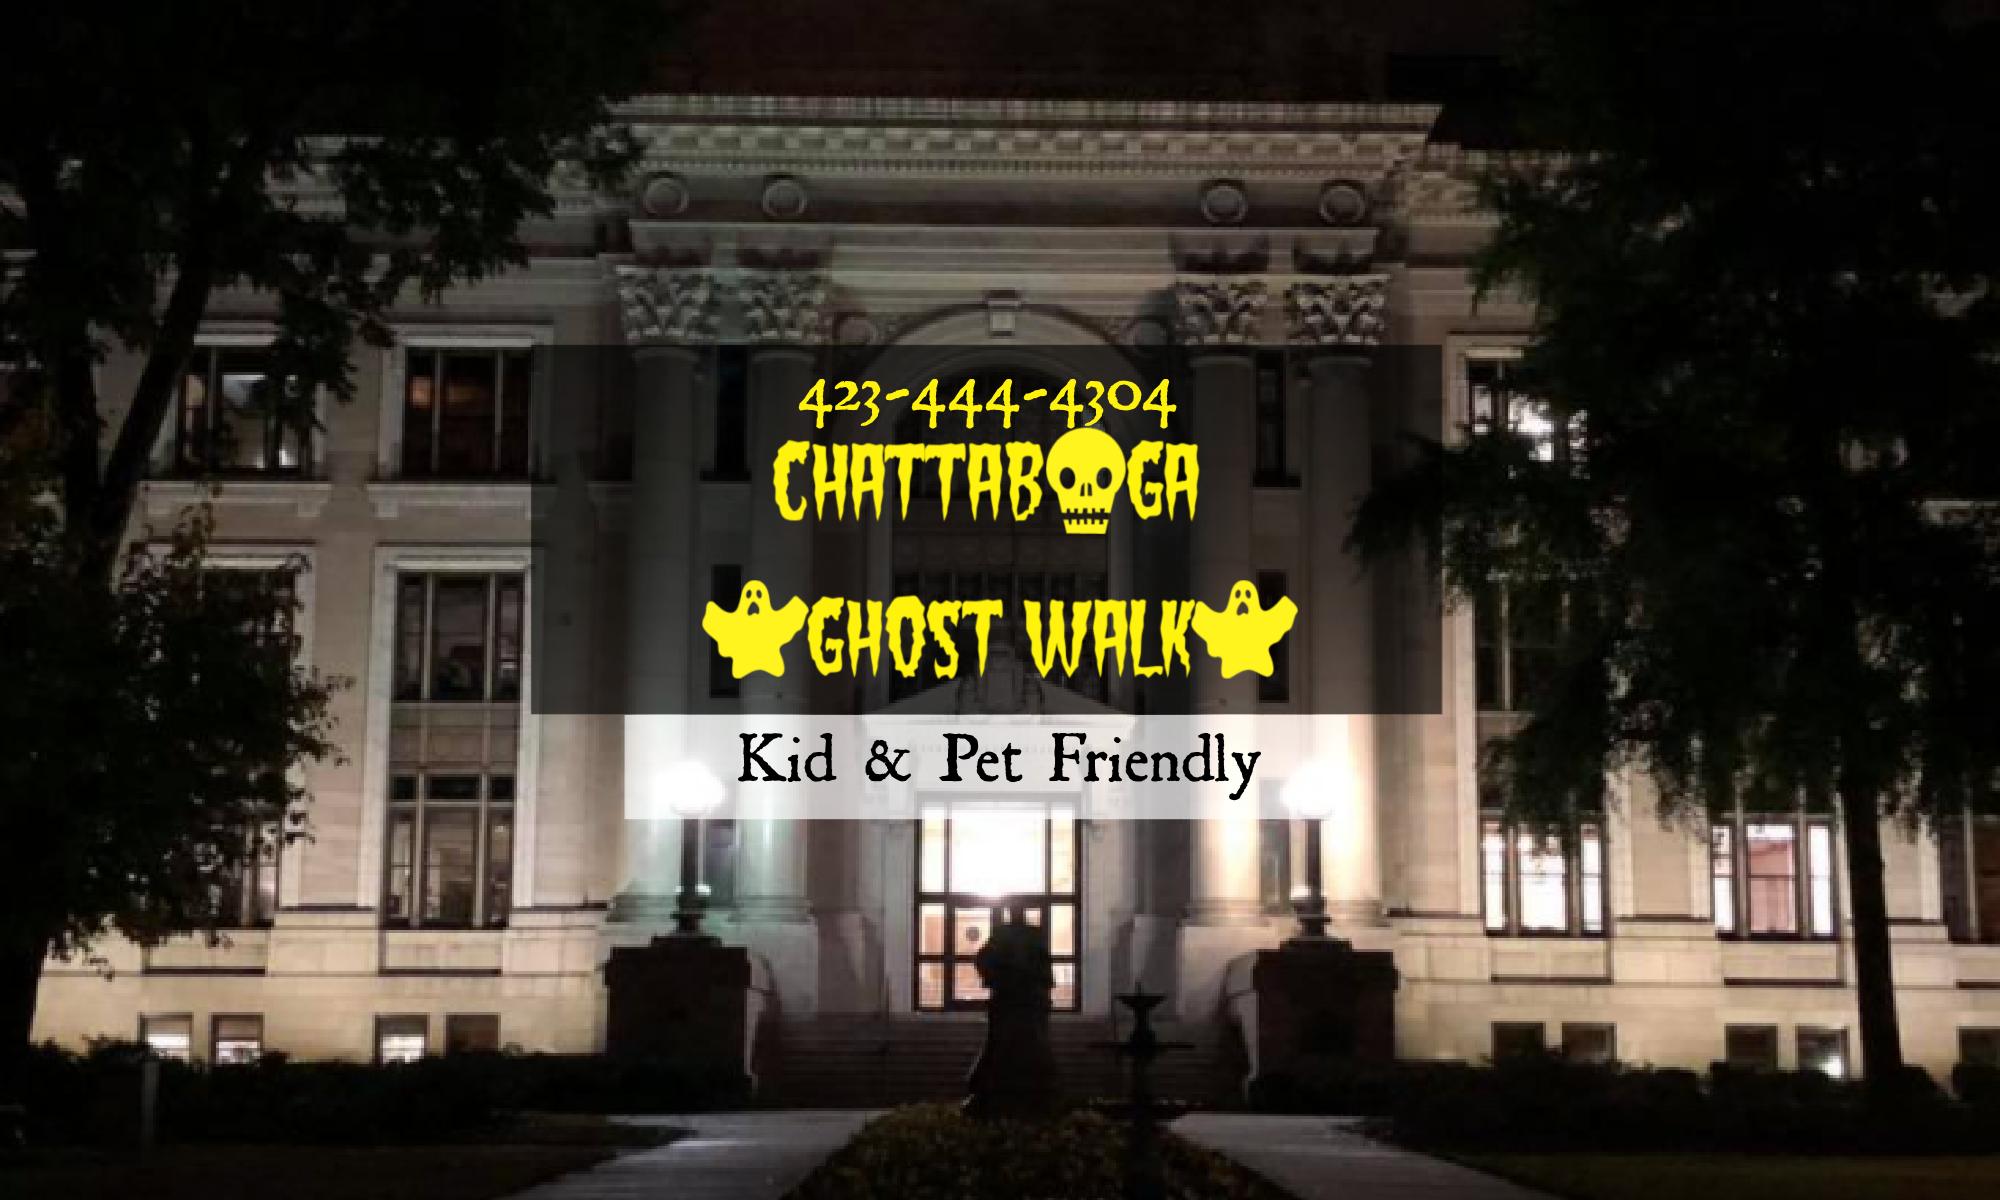 Chattabooga Ghost walk